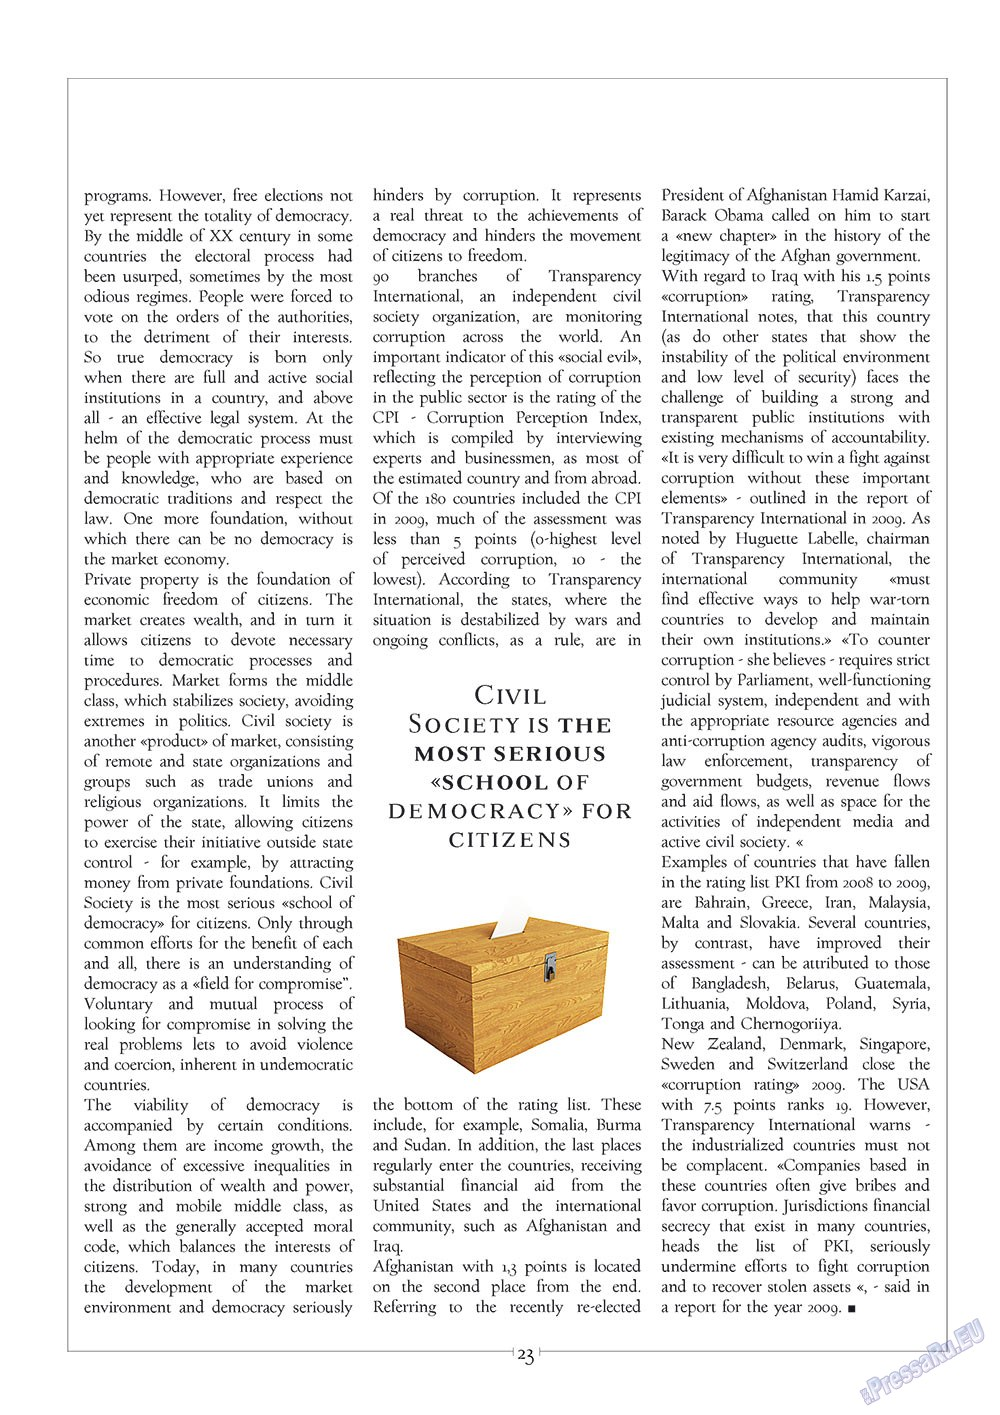 Европейский меридиан (журнал). 2010 год, номер 1, стр. 25